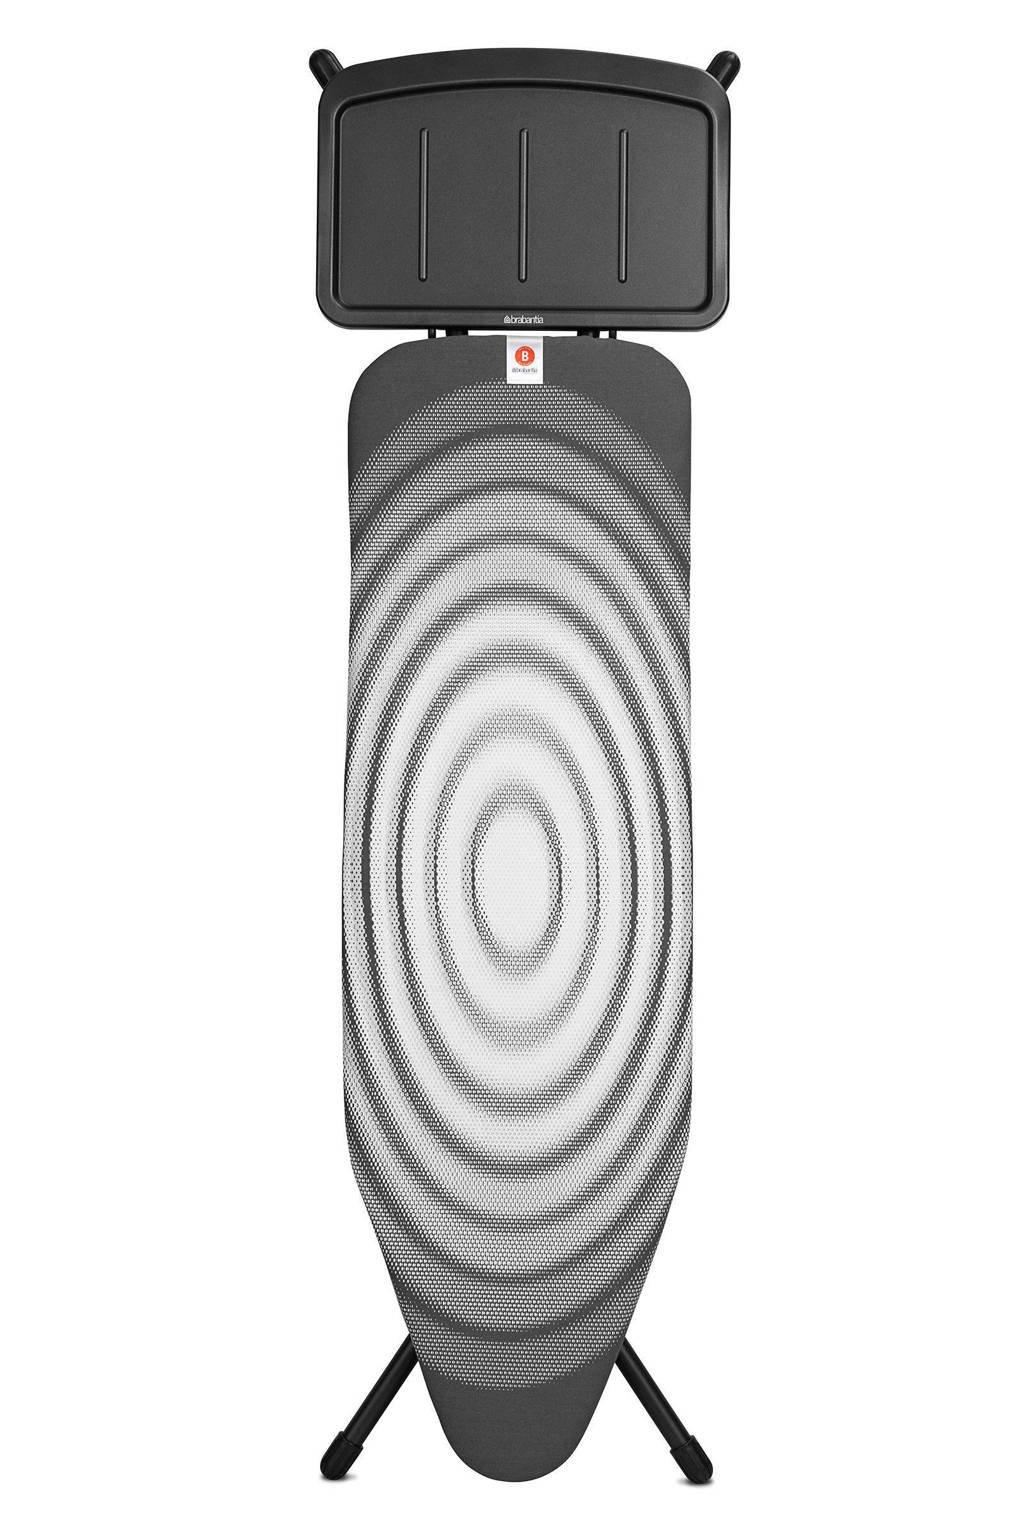 Brabantia Titan Oval, 124x38 cm strijkplank, Zwart